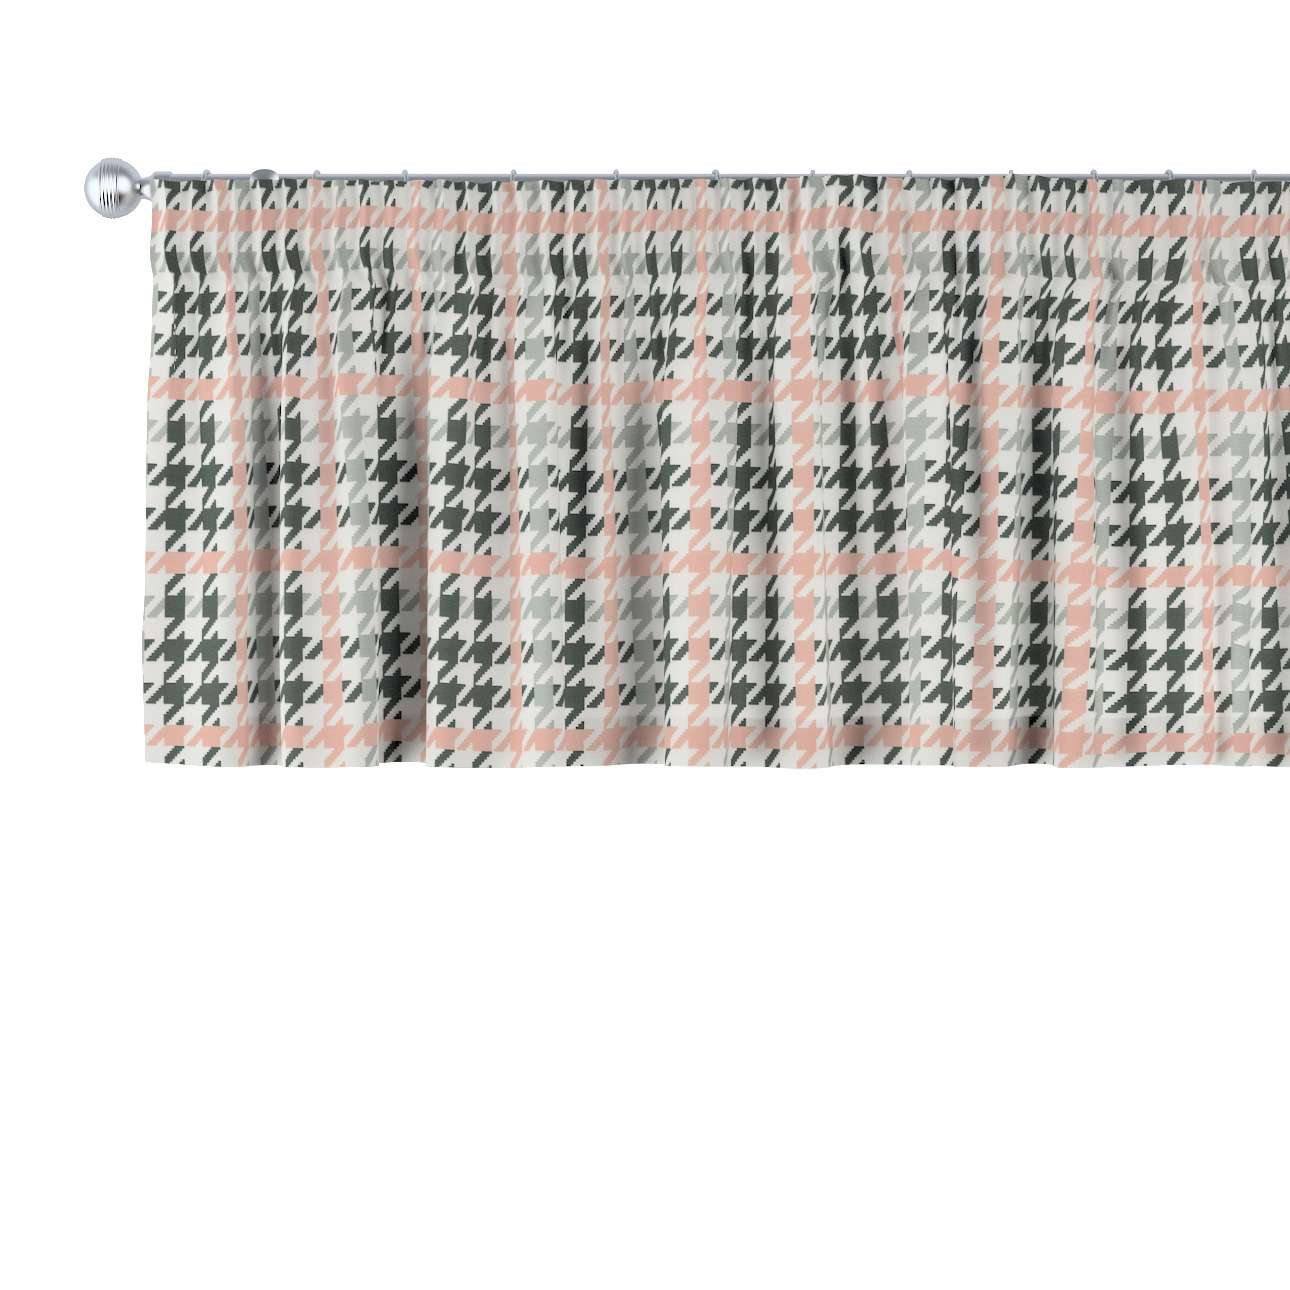 Kurzgardine mit Kräuselband 130 x 40 cm von der Kollektion Brooklyn, Stoff: 137-75